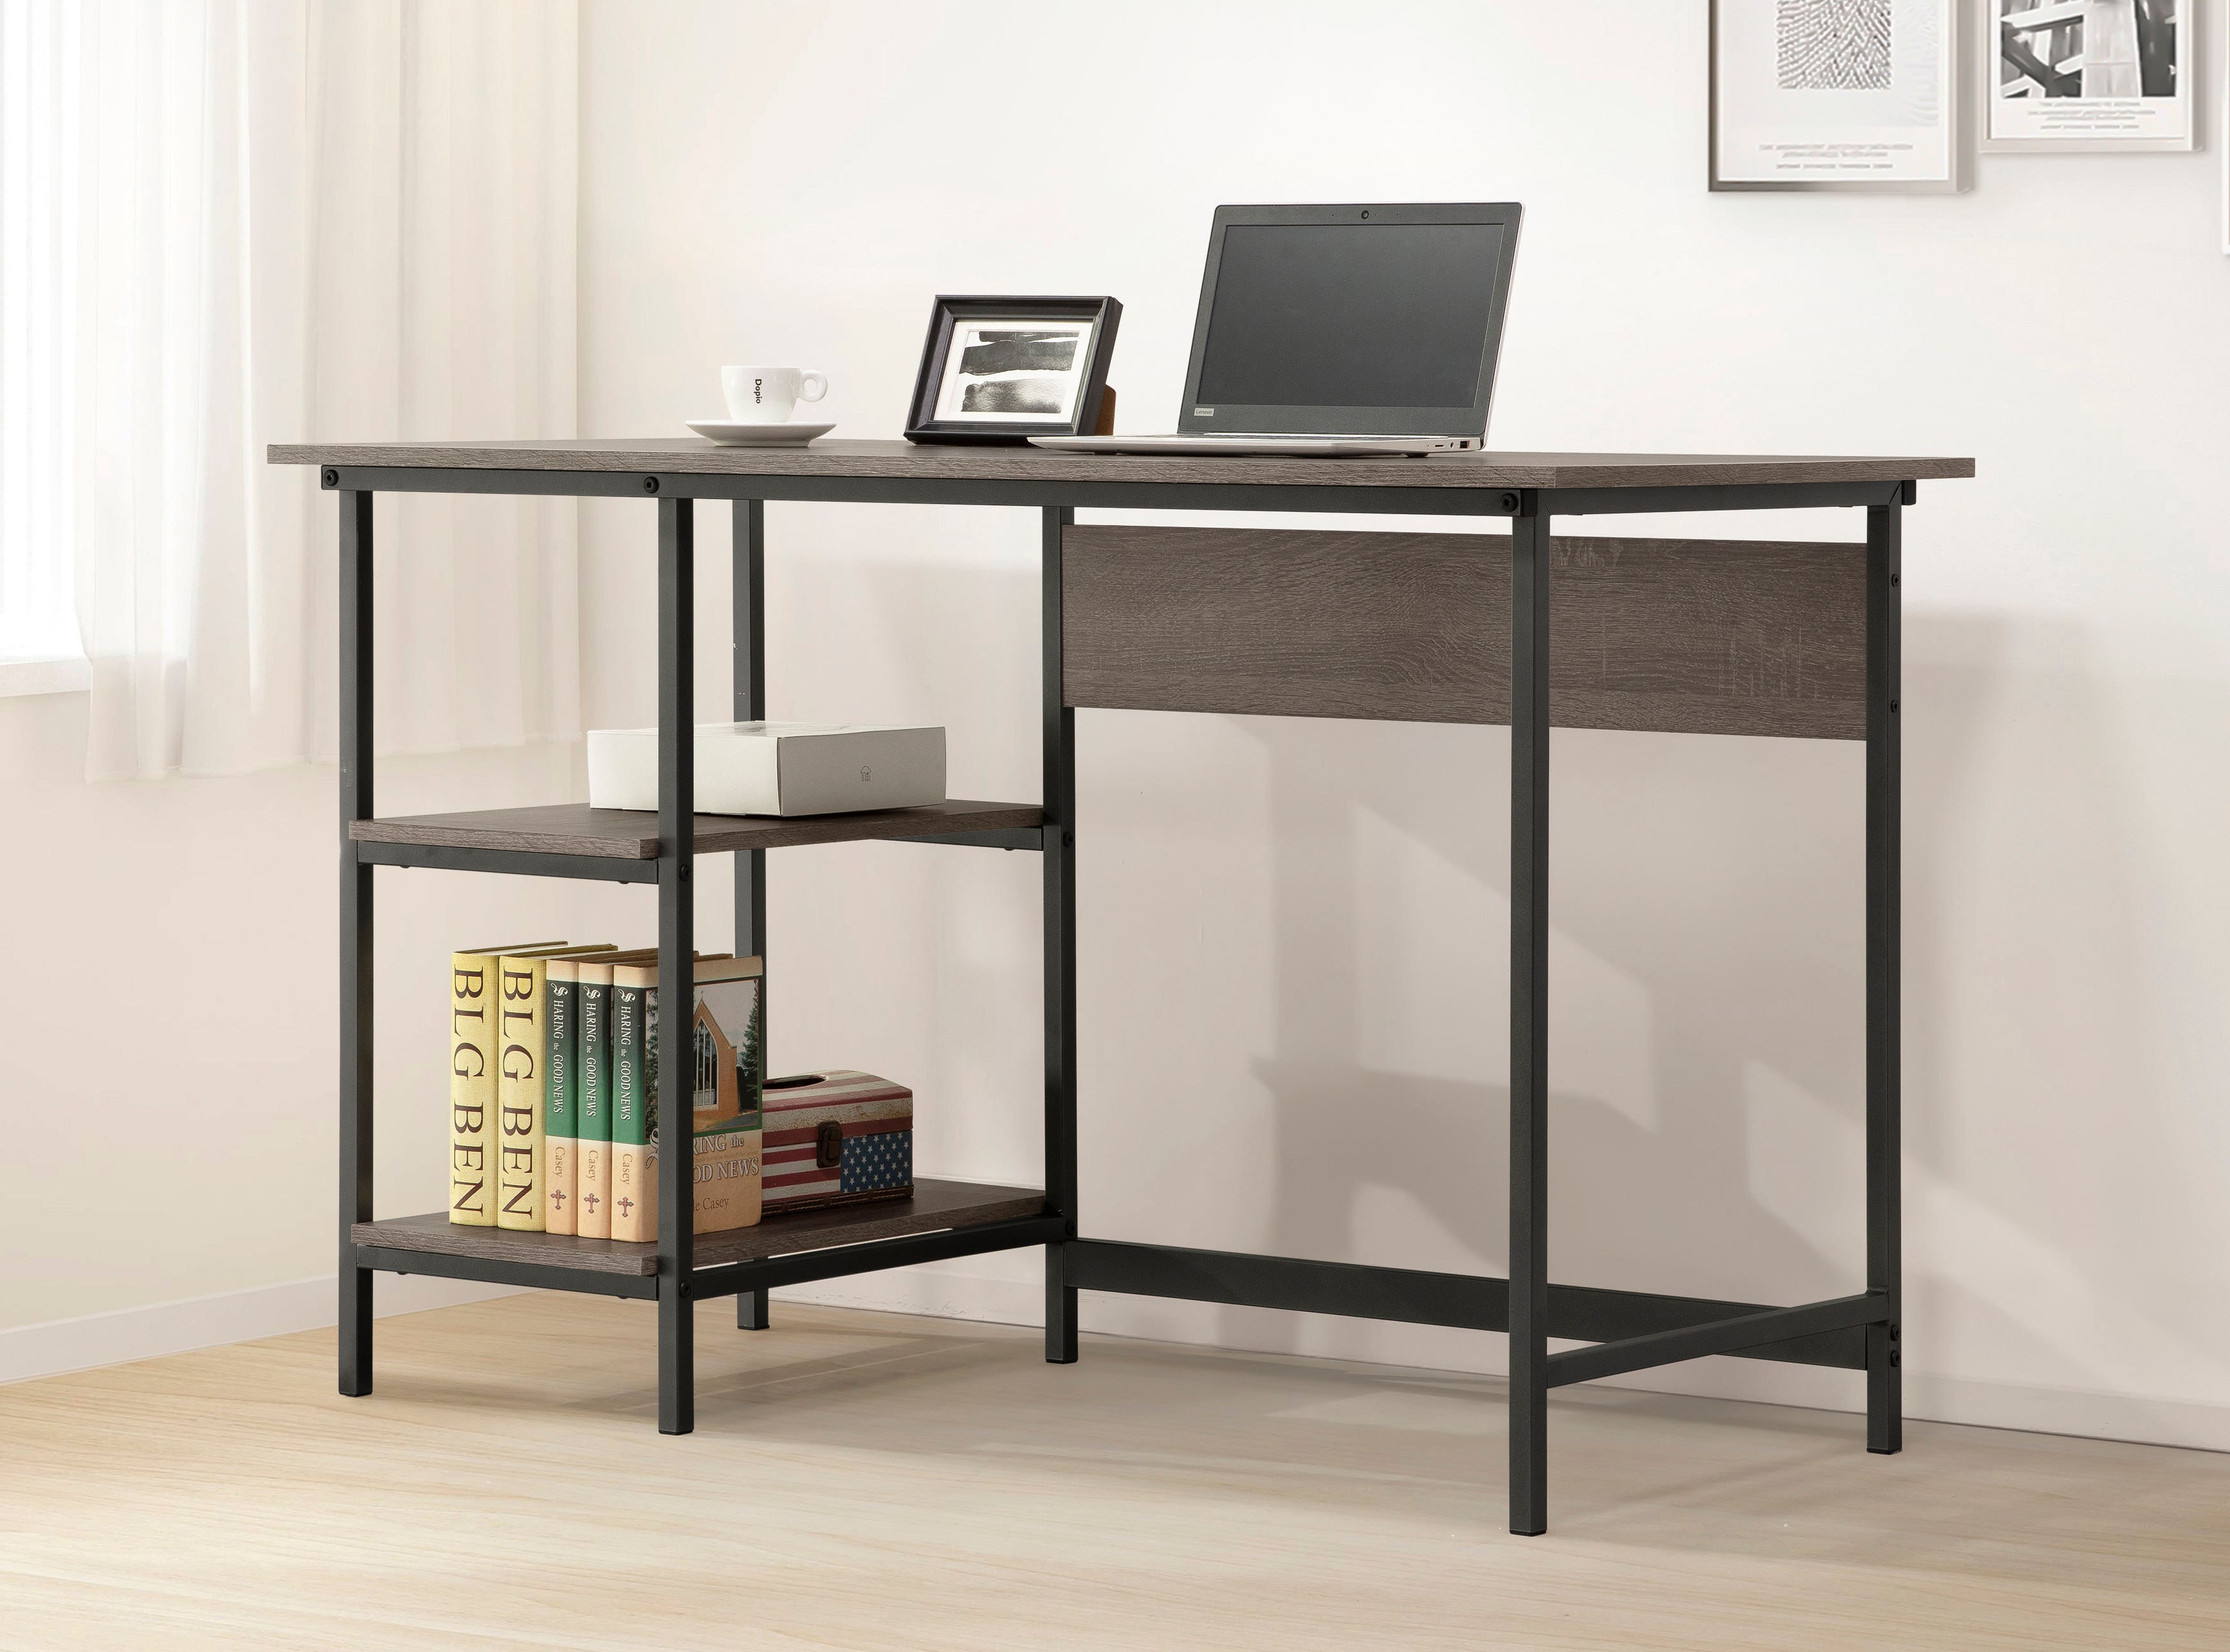 402-715 Single Pedestal Desk